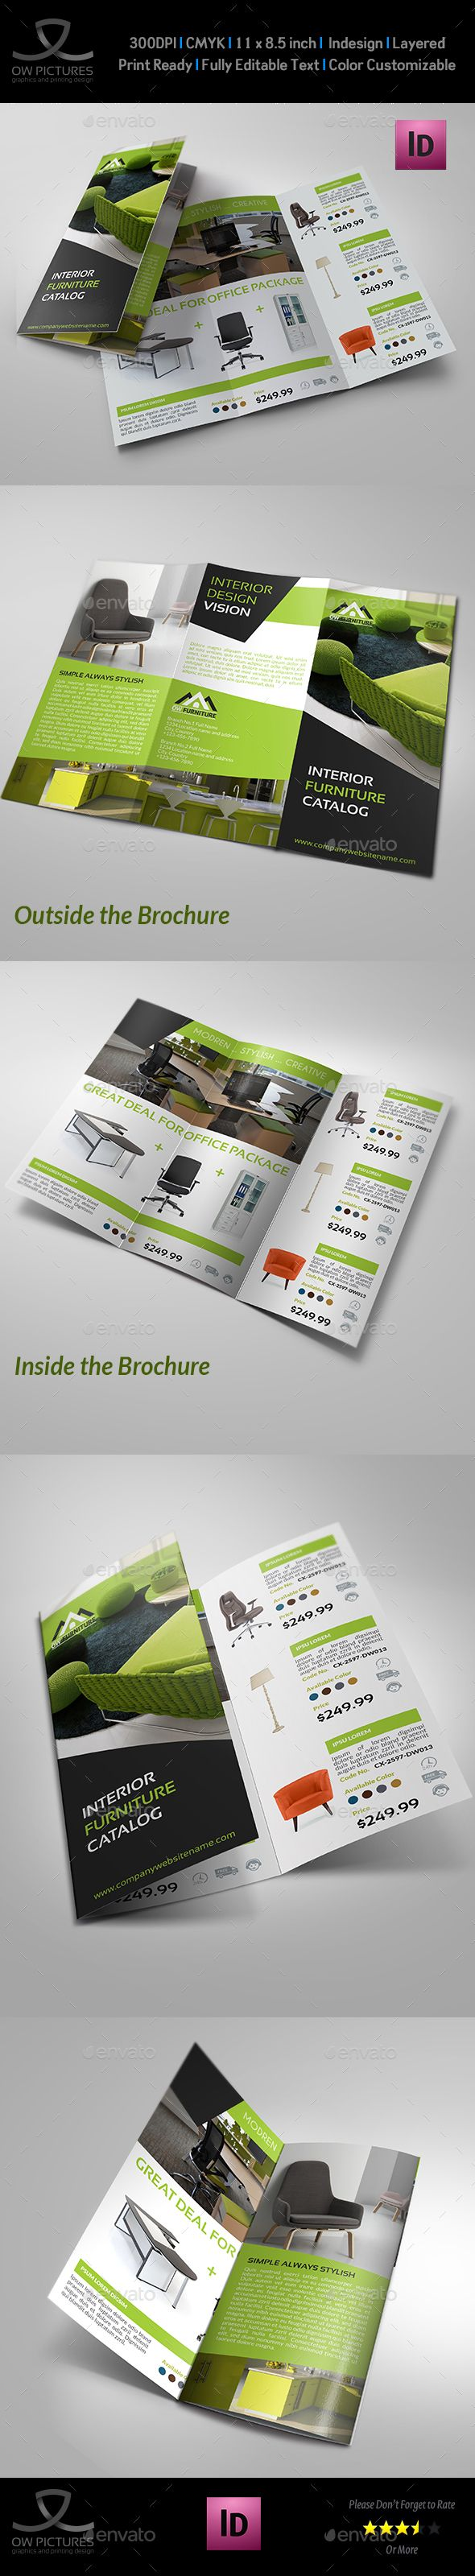 Furniture Products Catalog Tri-Fold Brochure Template InDesign INDD #design Download: http://graphicriver.net/item/furniture-products-catalog-trifold-brochure/13959044?ref=ksioks